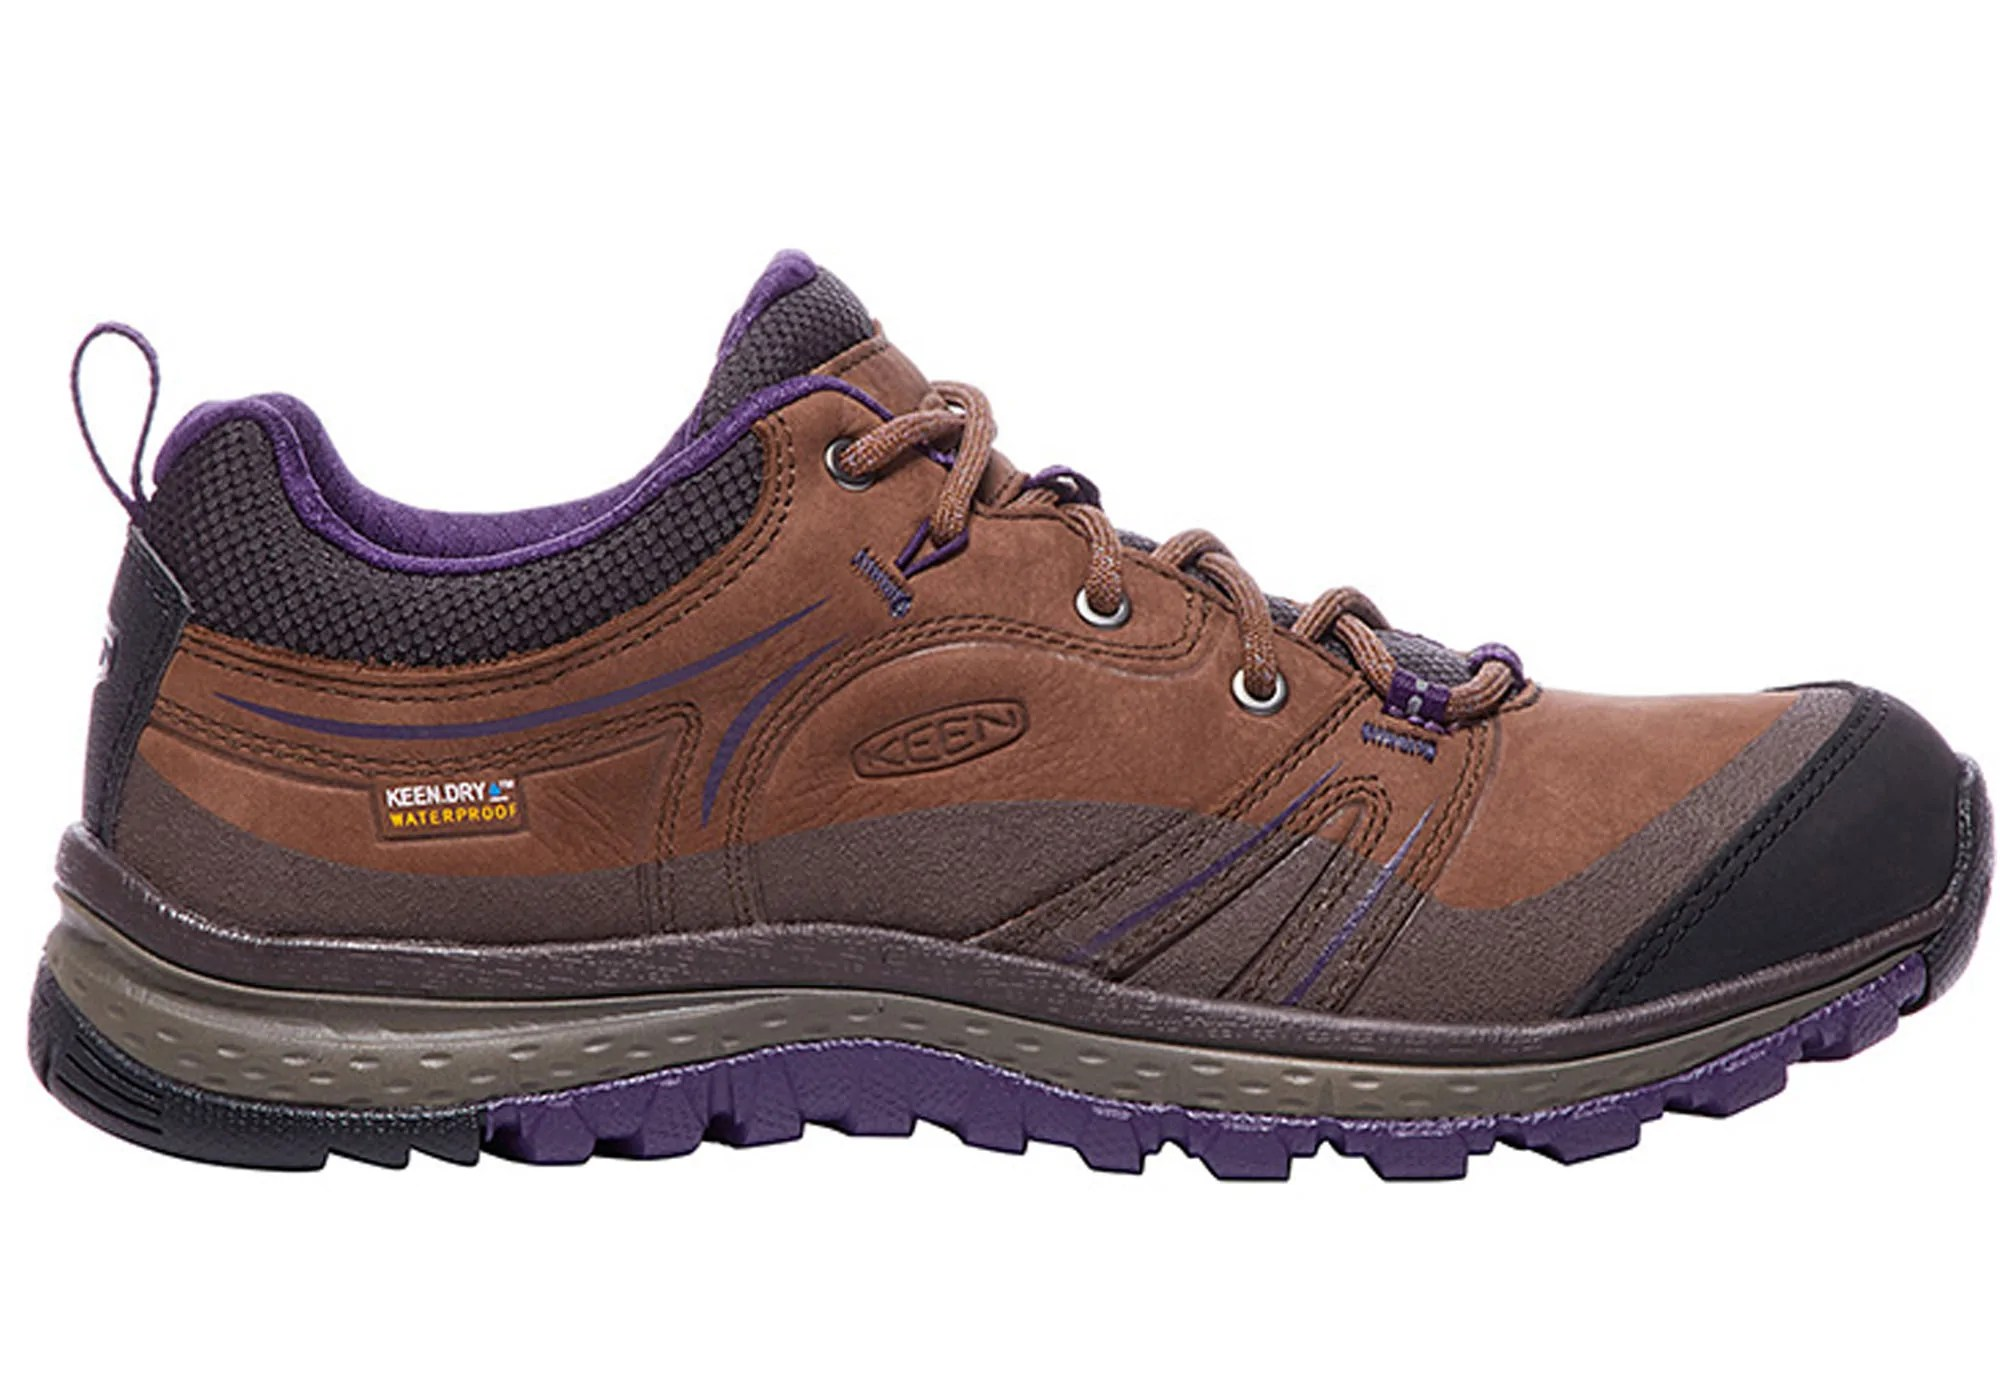 Keen Terradora Leather Waterproof Womens Comfort Hiking